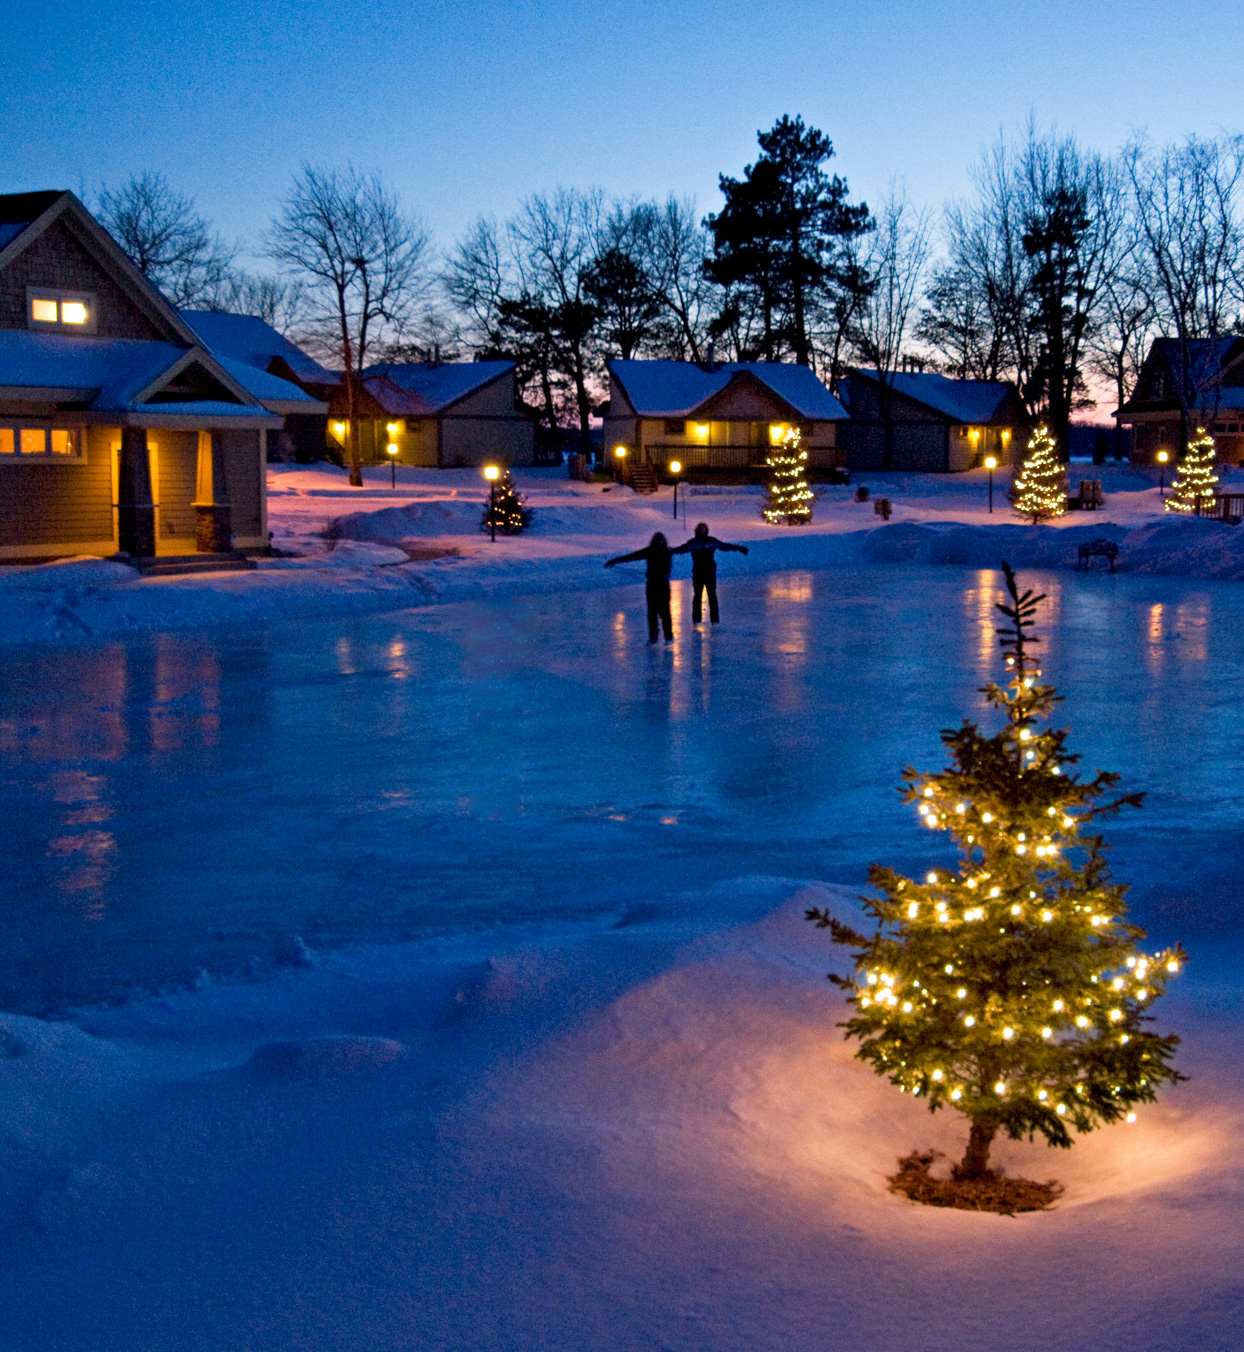 lit christmas trees near frozen pond